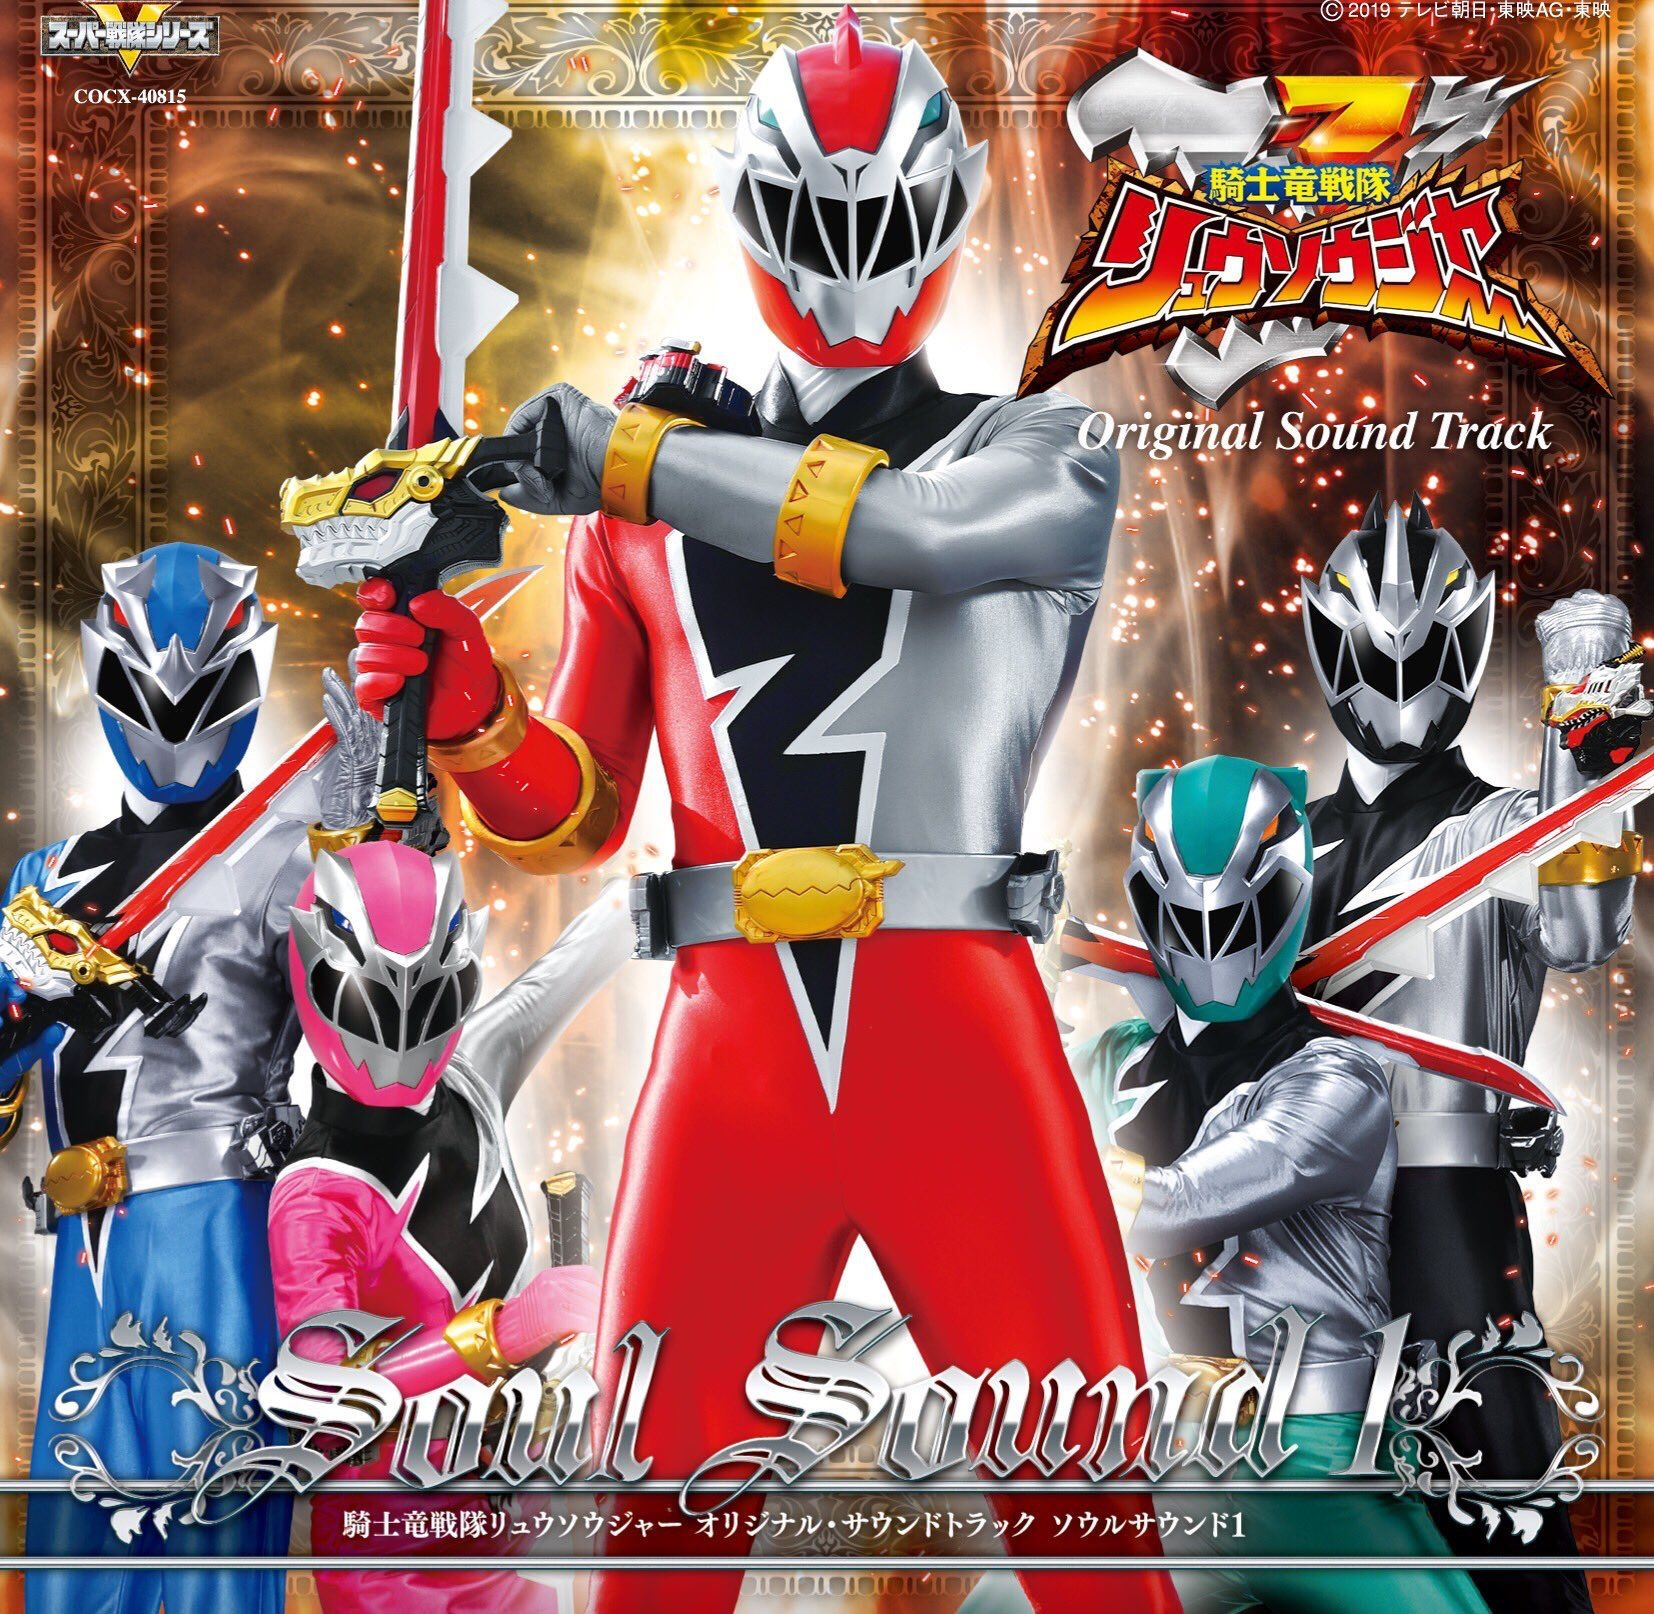 Kishiryu Sentai Ryusoulger | Super Sentai/Power Rangers | Cd